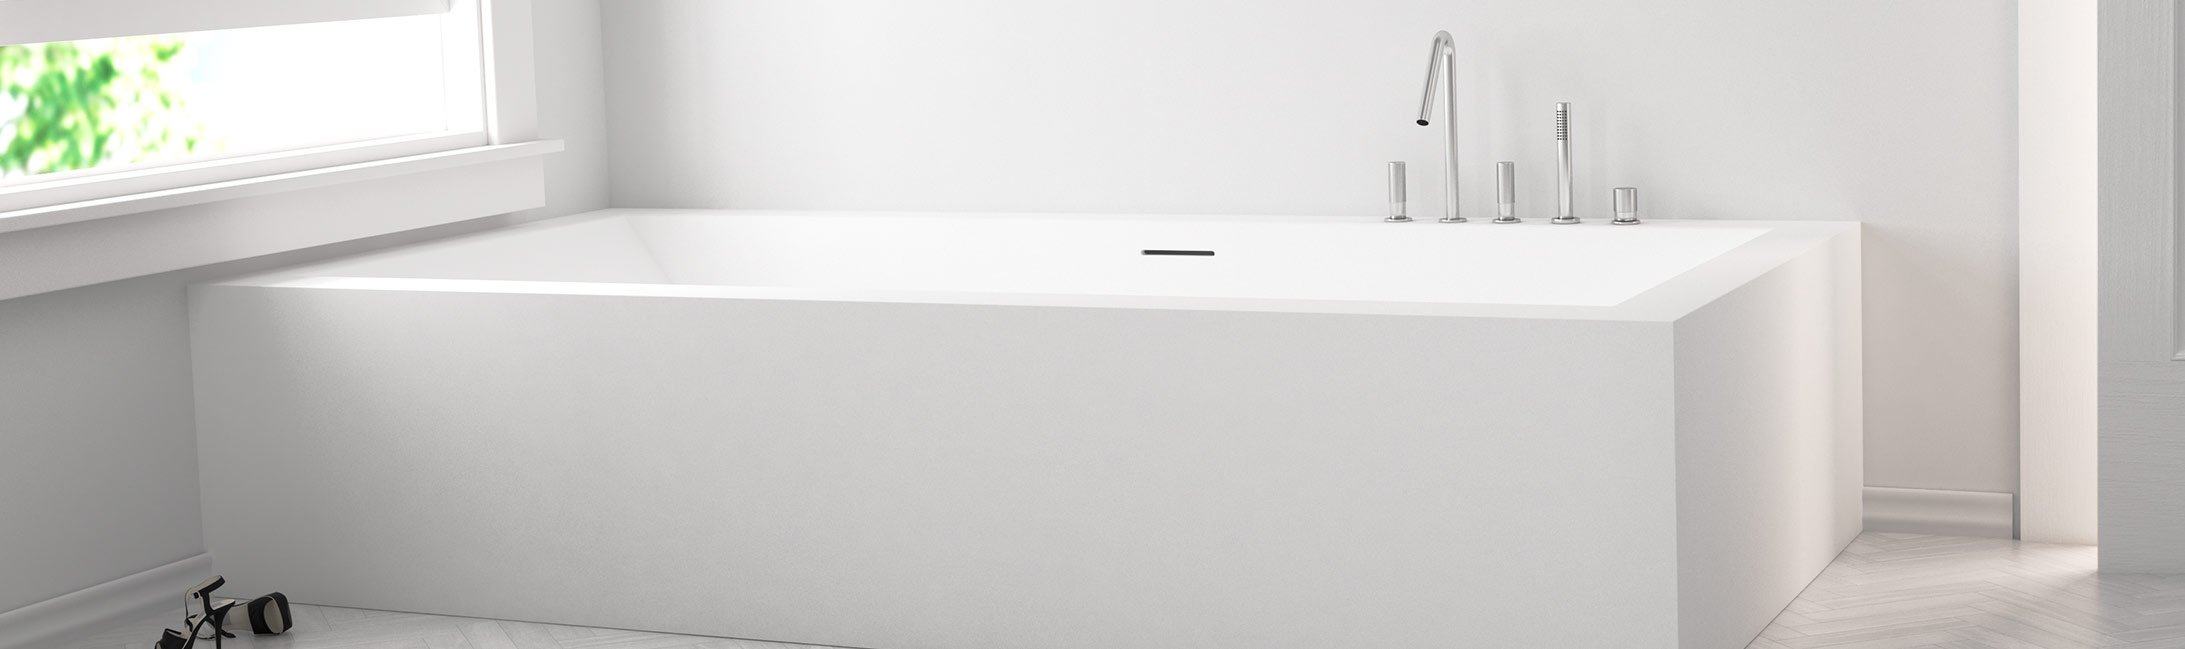 Baths corian